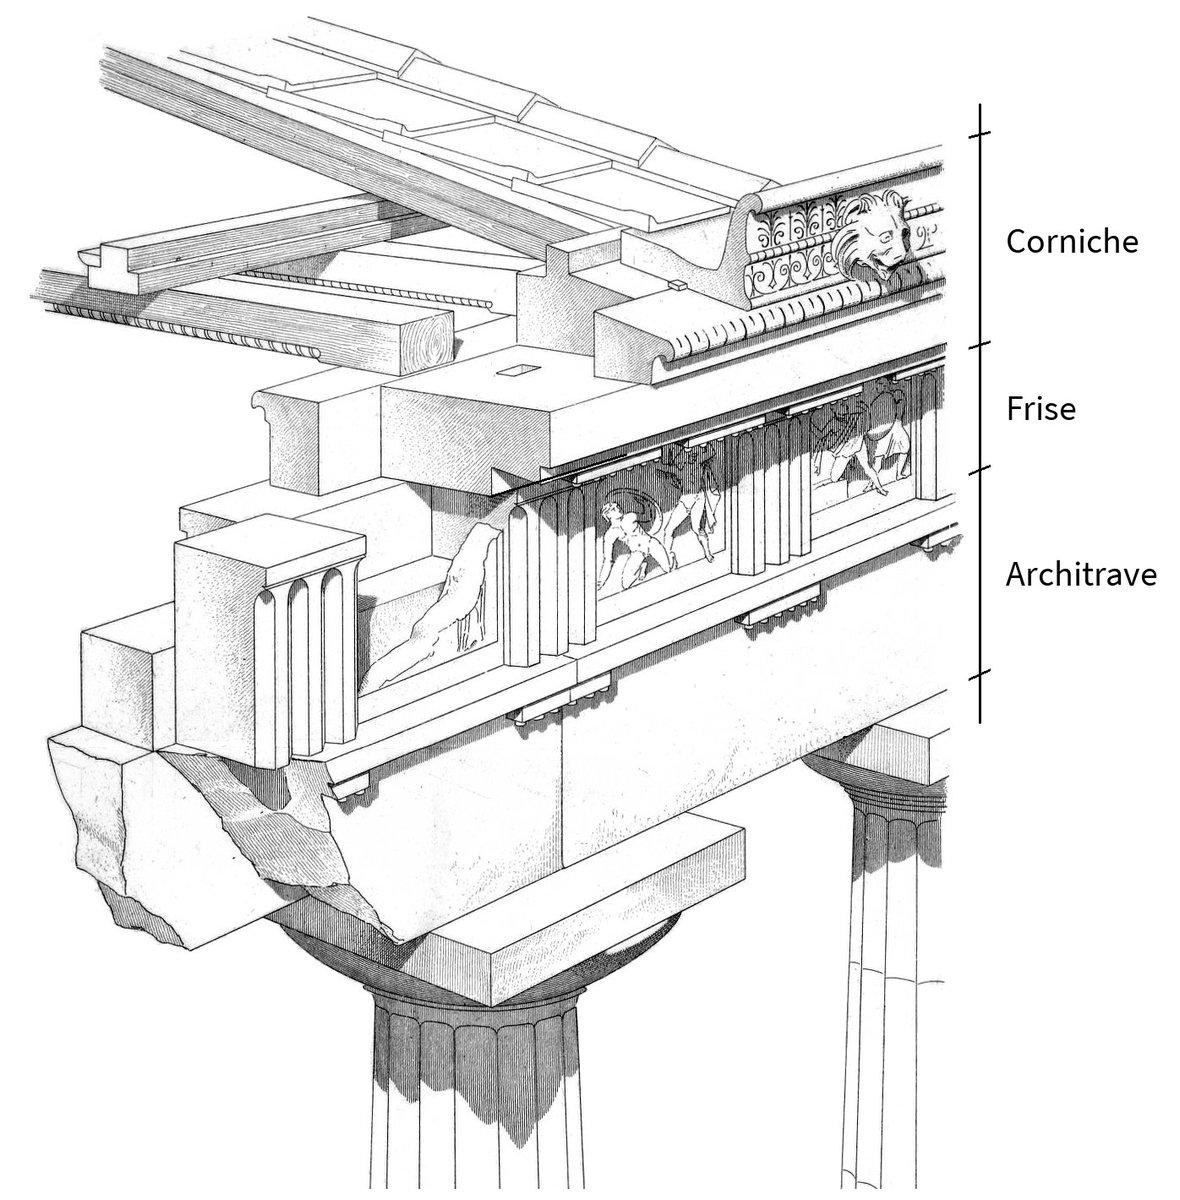 Rangehoodspecs moreover Corbel additionally Typical Eaves Detail moreover Brick Ledge Detail YX7vg8sUlYq7pbk6SLn7USsqqJpJUOeXjlML2rQba 0 additionally On18 Trestle Pt. on corbel dimensions